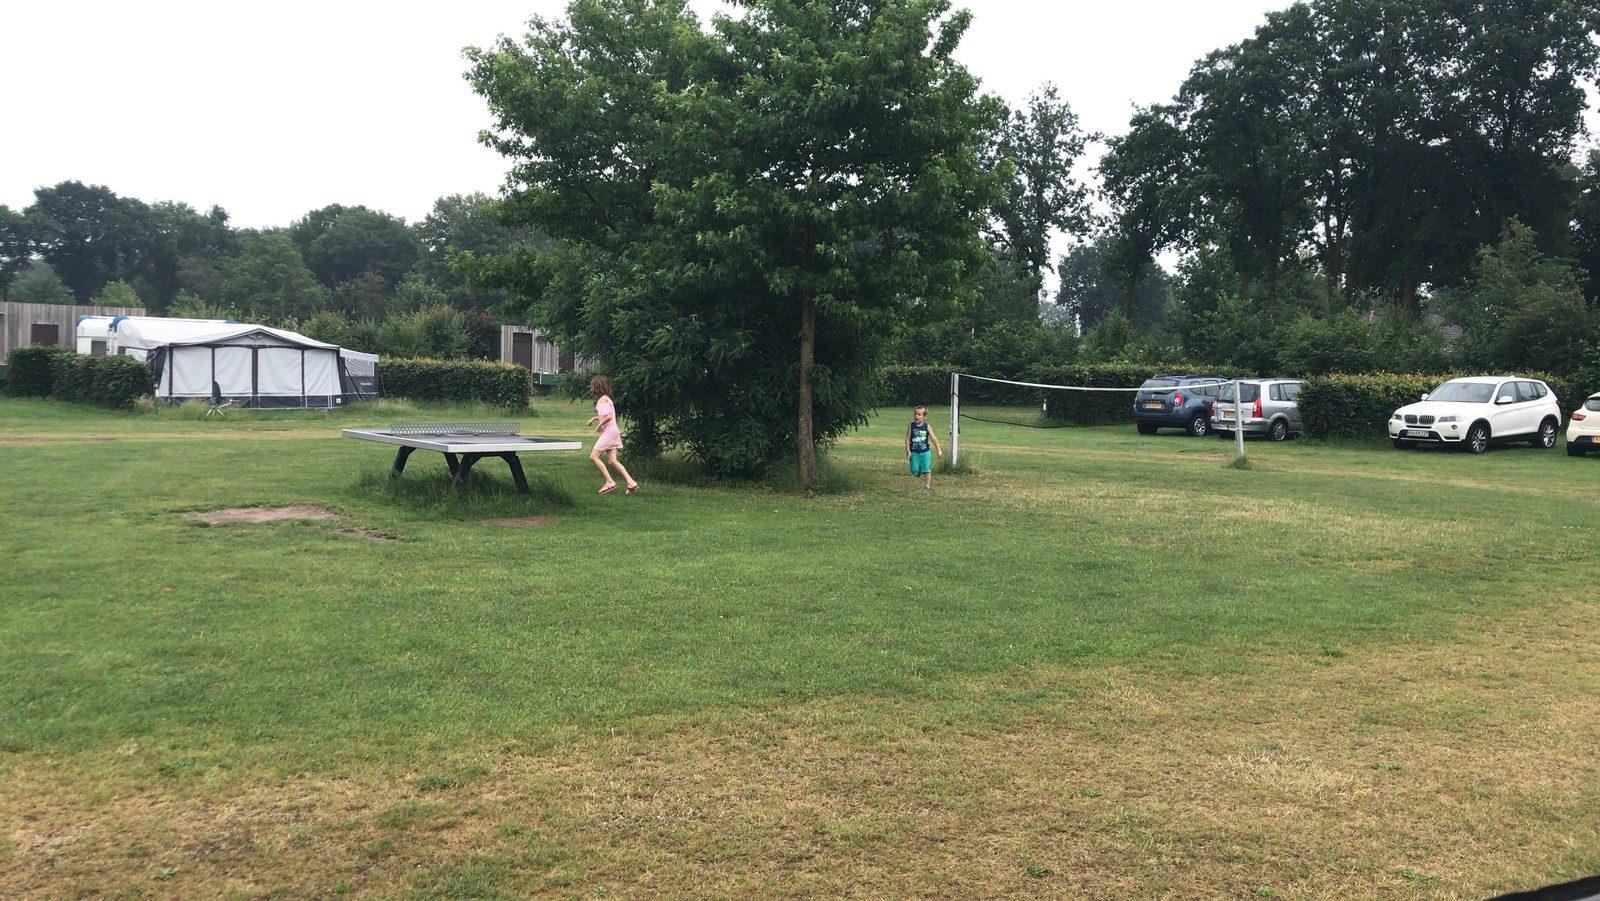 Blog - Weekendje Safaricottage op de Veluwe